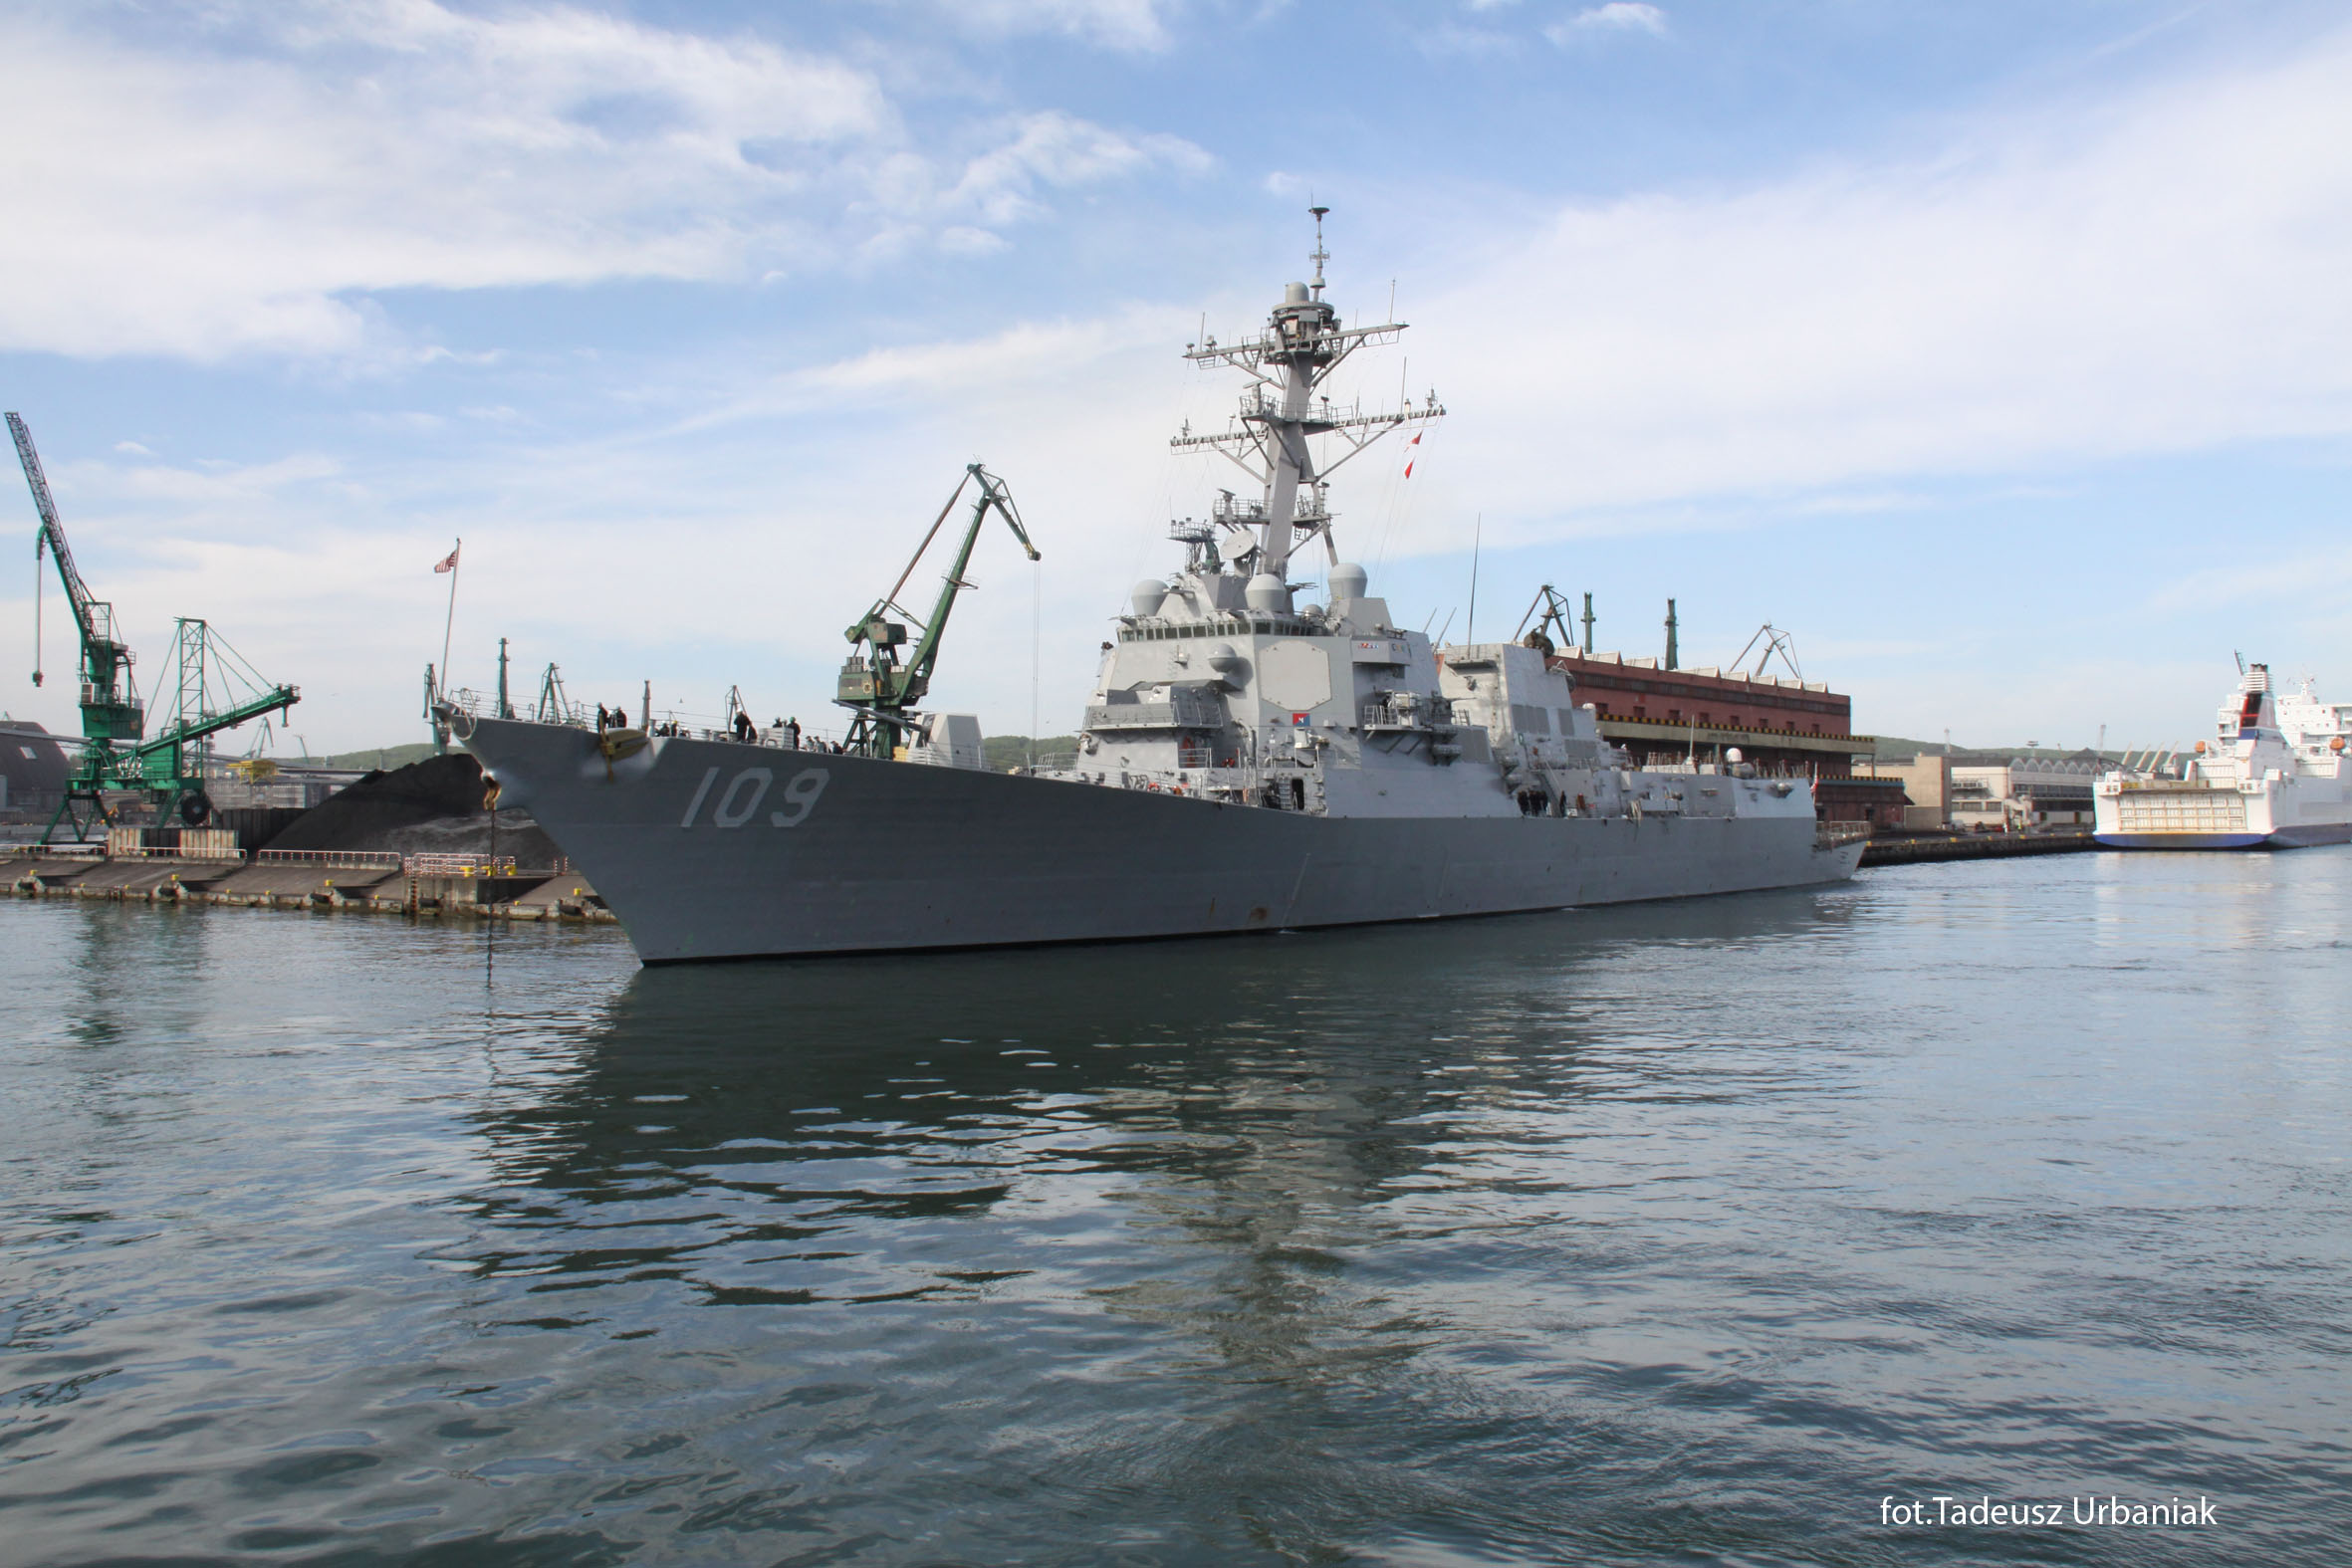 USS JASON DUNHAM DDG-109 am 04.06.2015 in Gdansk, Polen Bild: Port Gdynia, Tadeusz Urbaniak